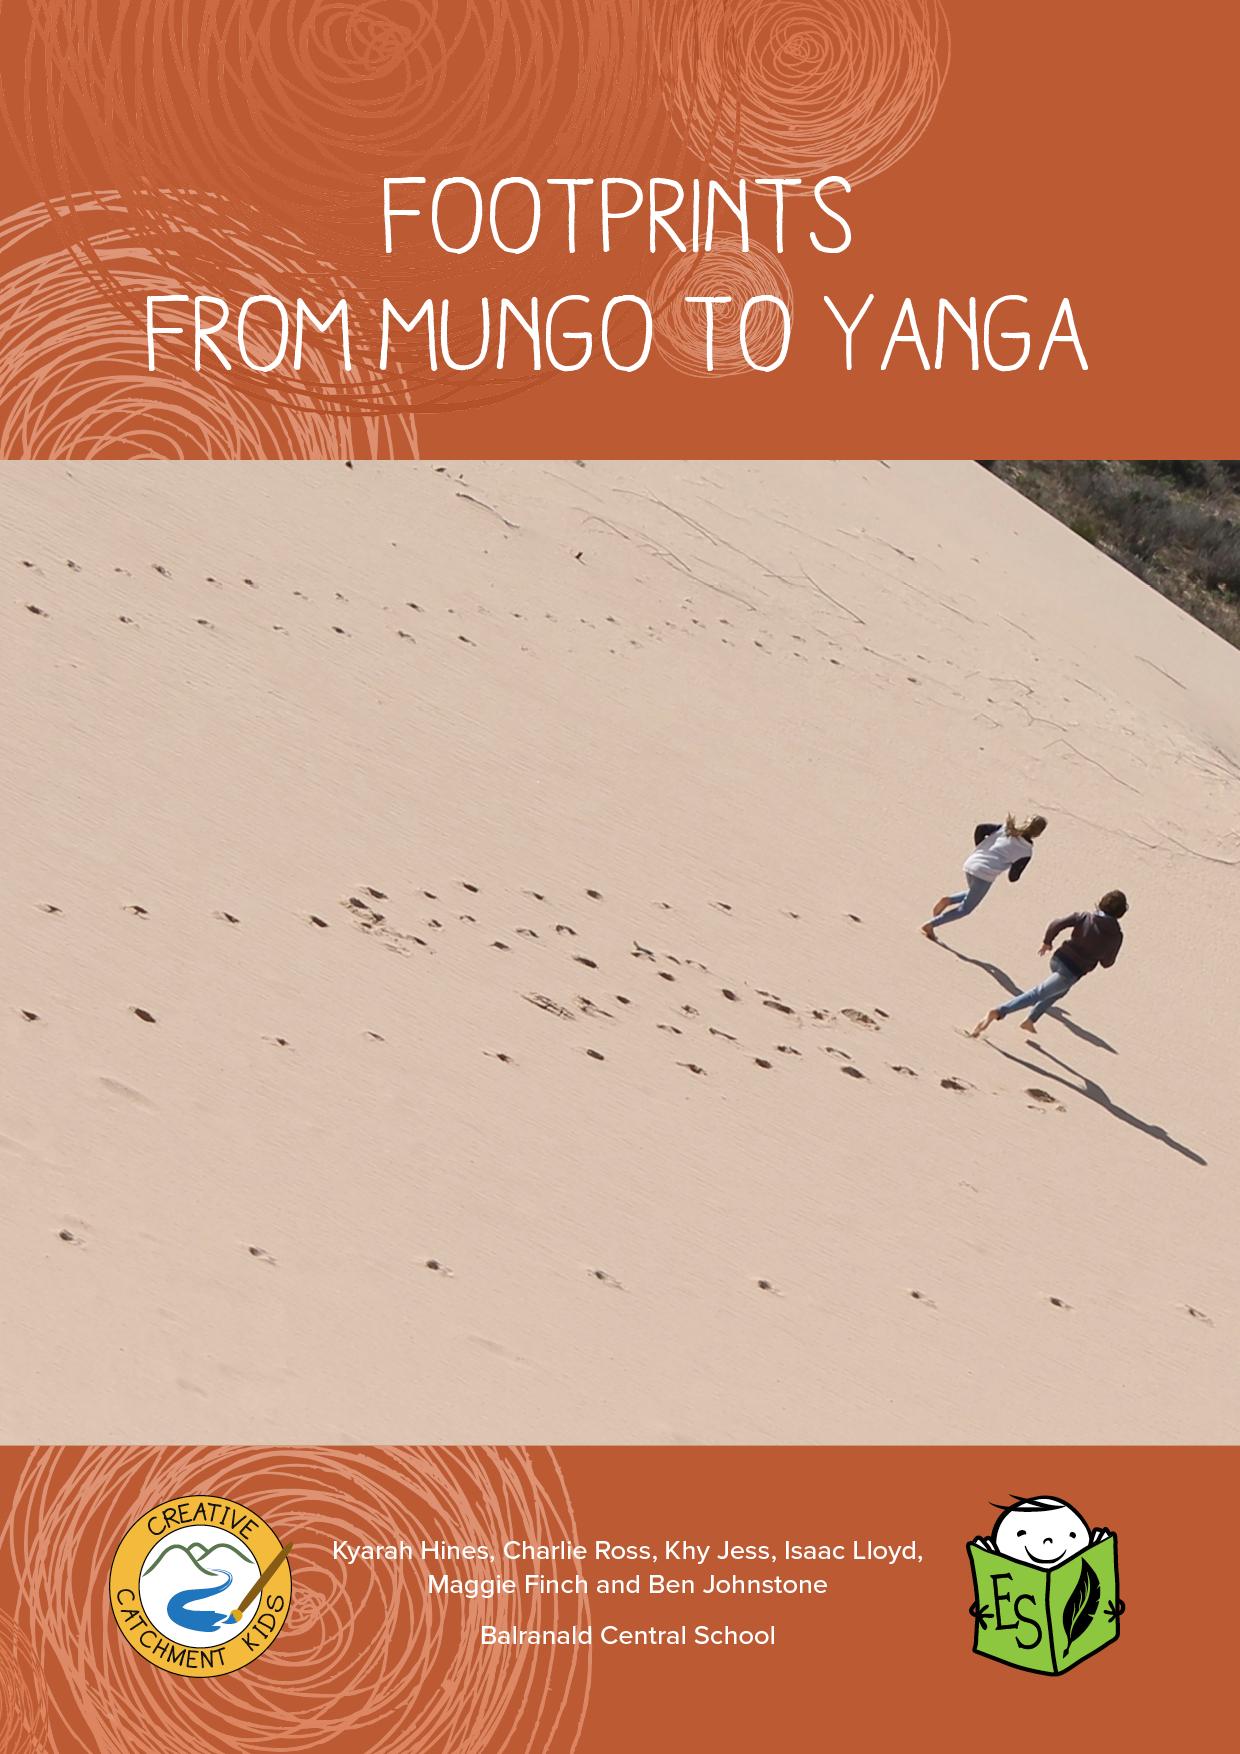 Footprints from Mungo to Yanga